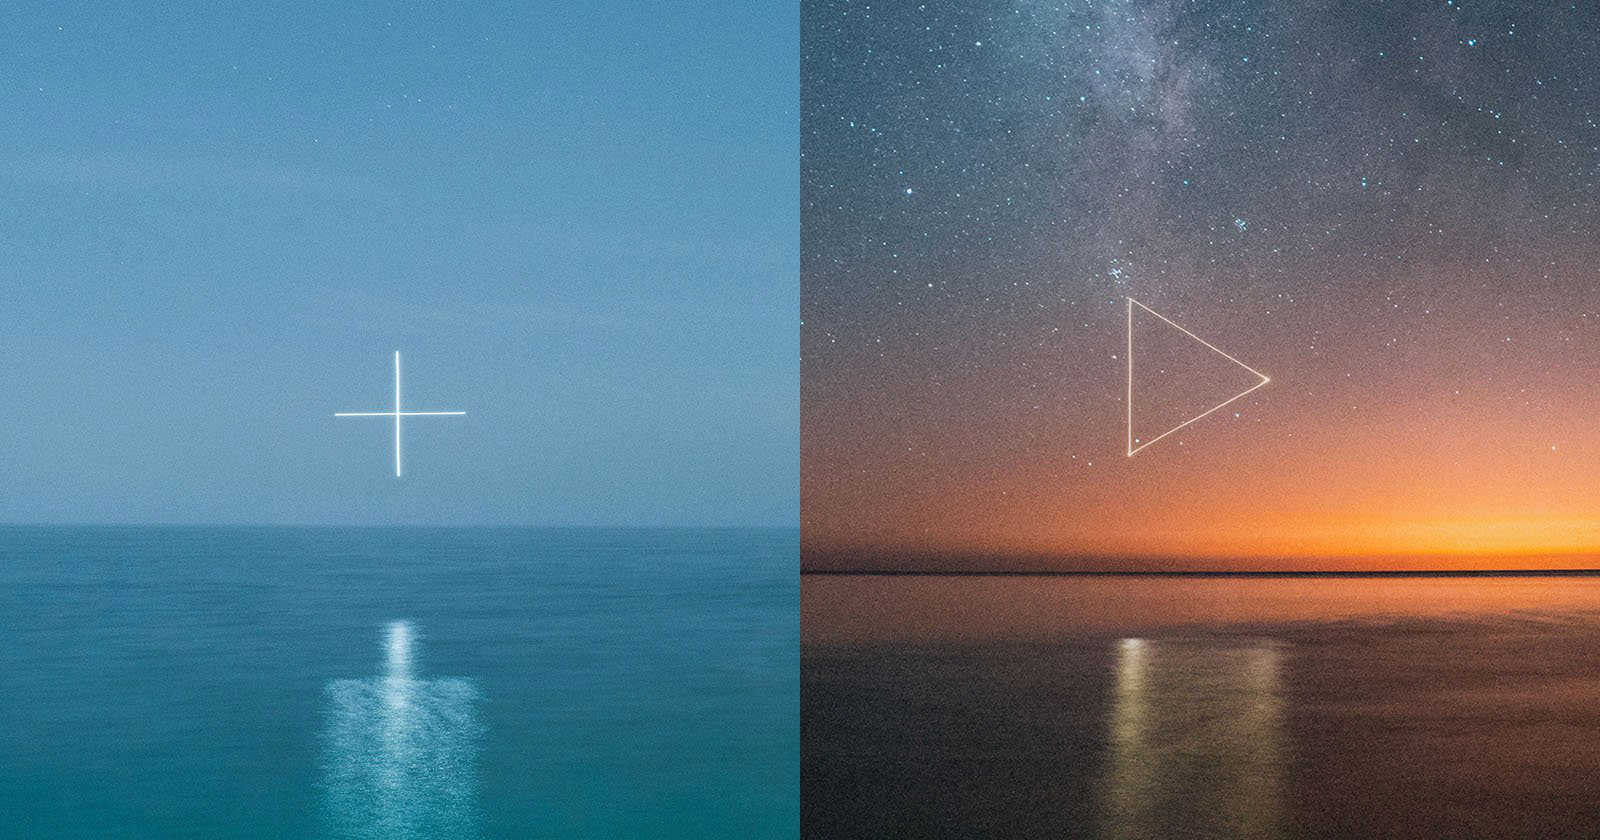 Drone Light Symbols